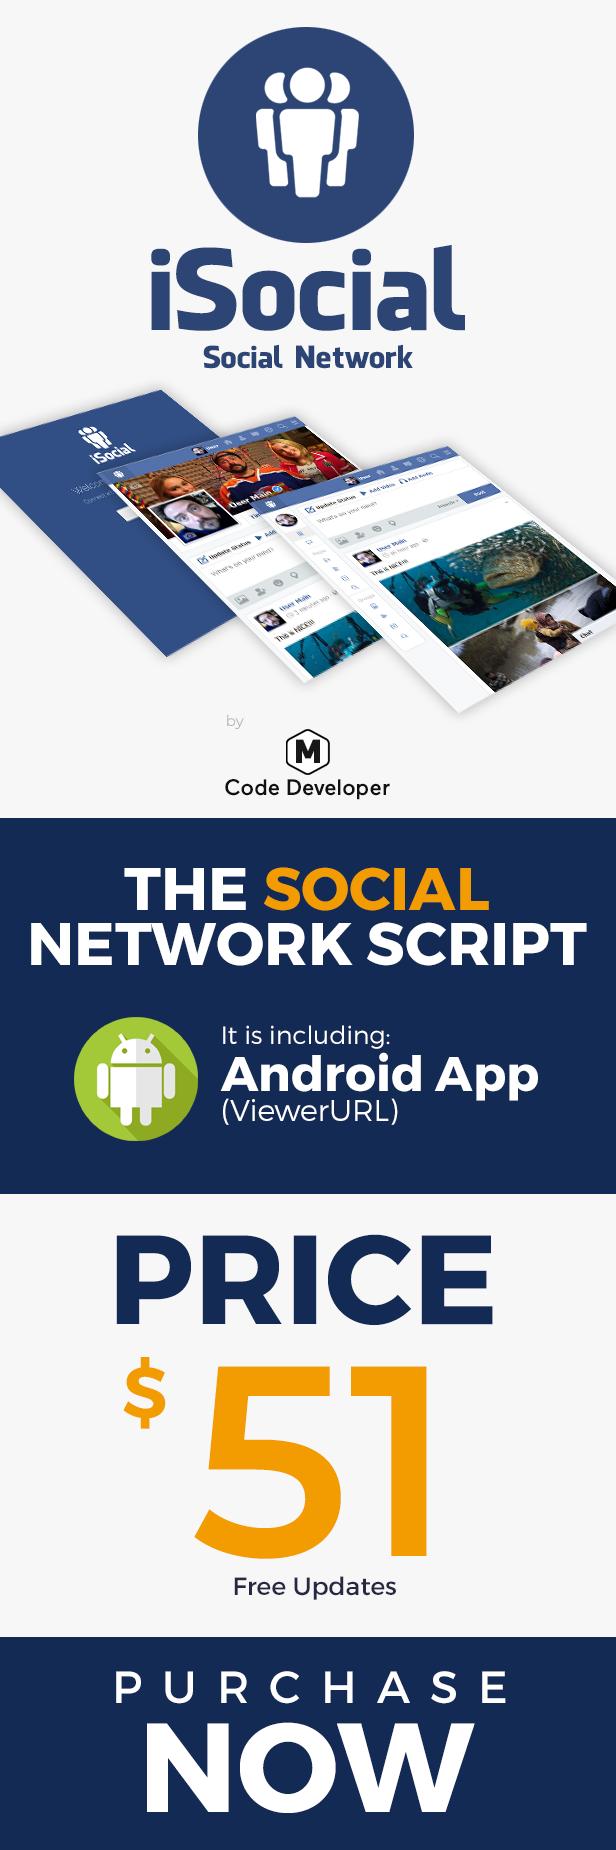 iSocial - Social Network Platform - 1